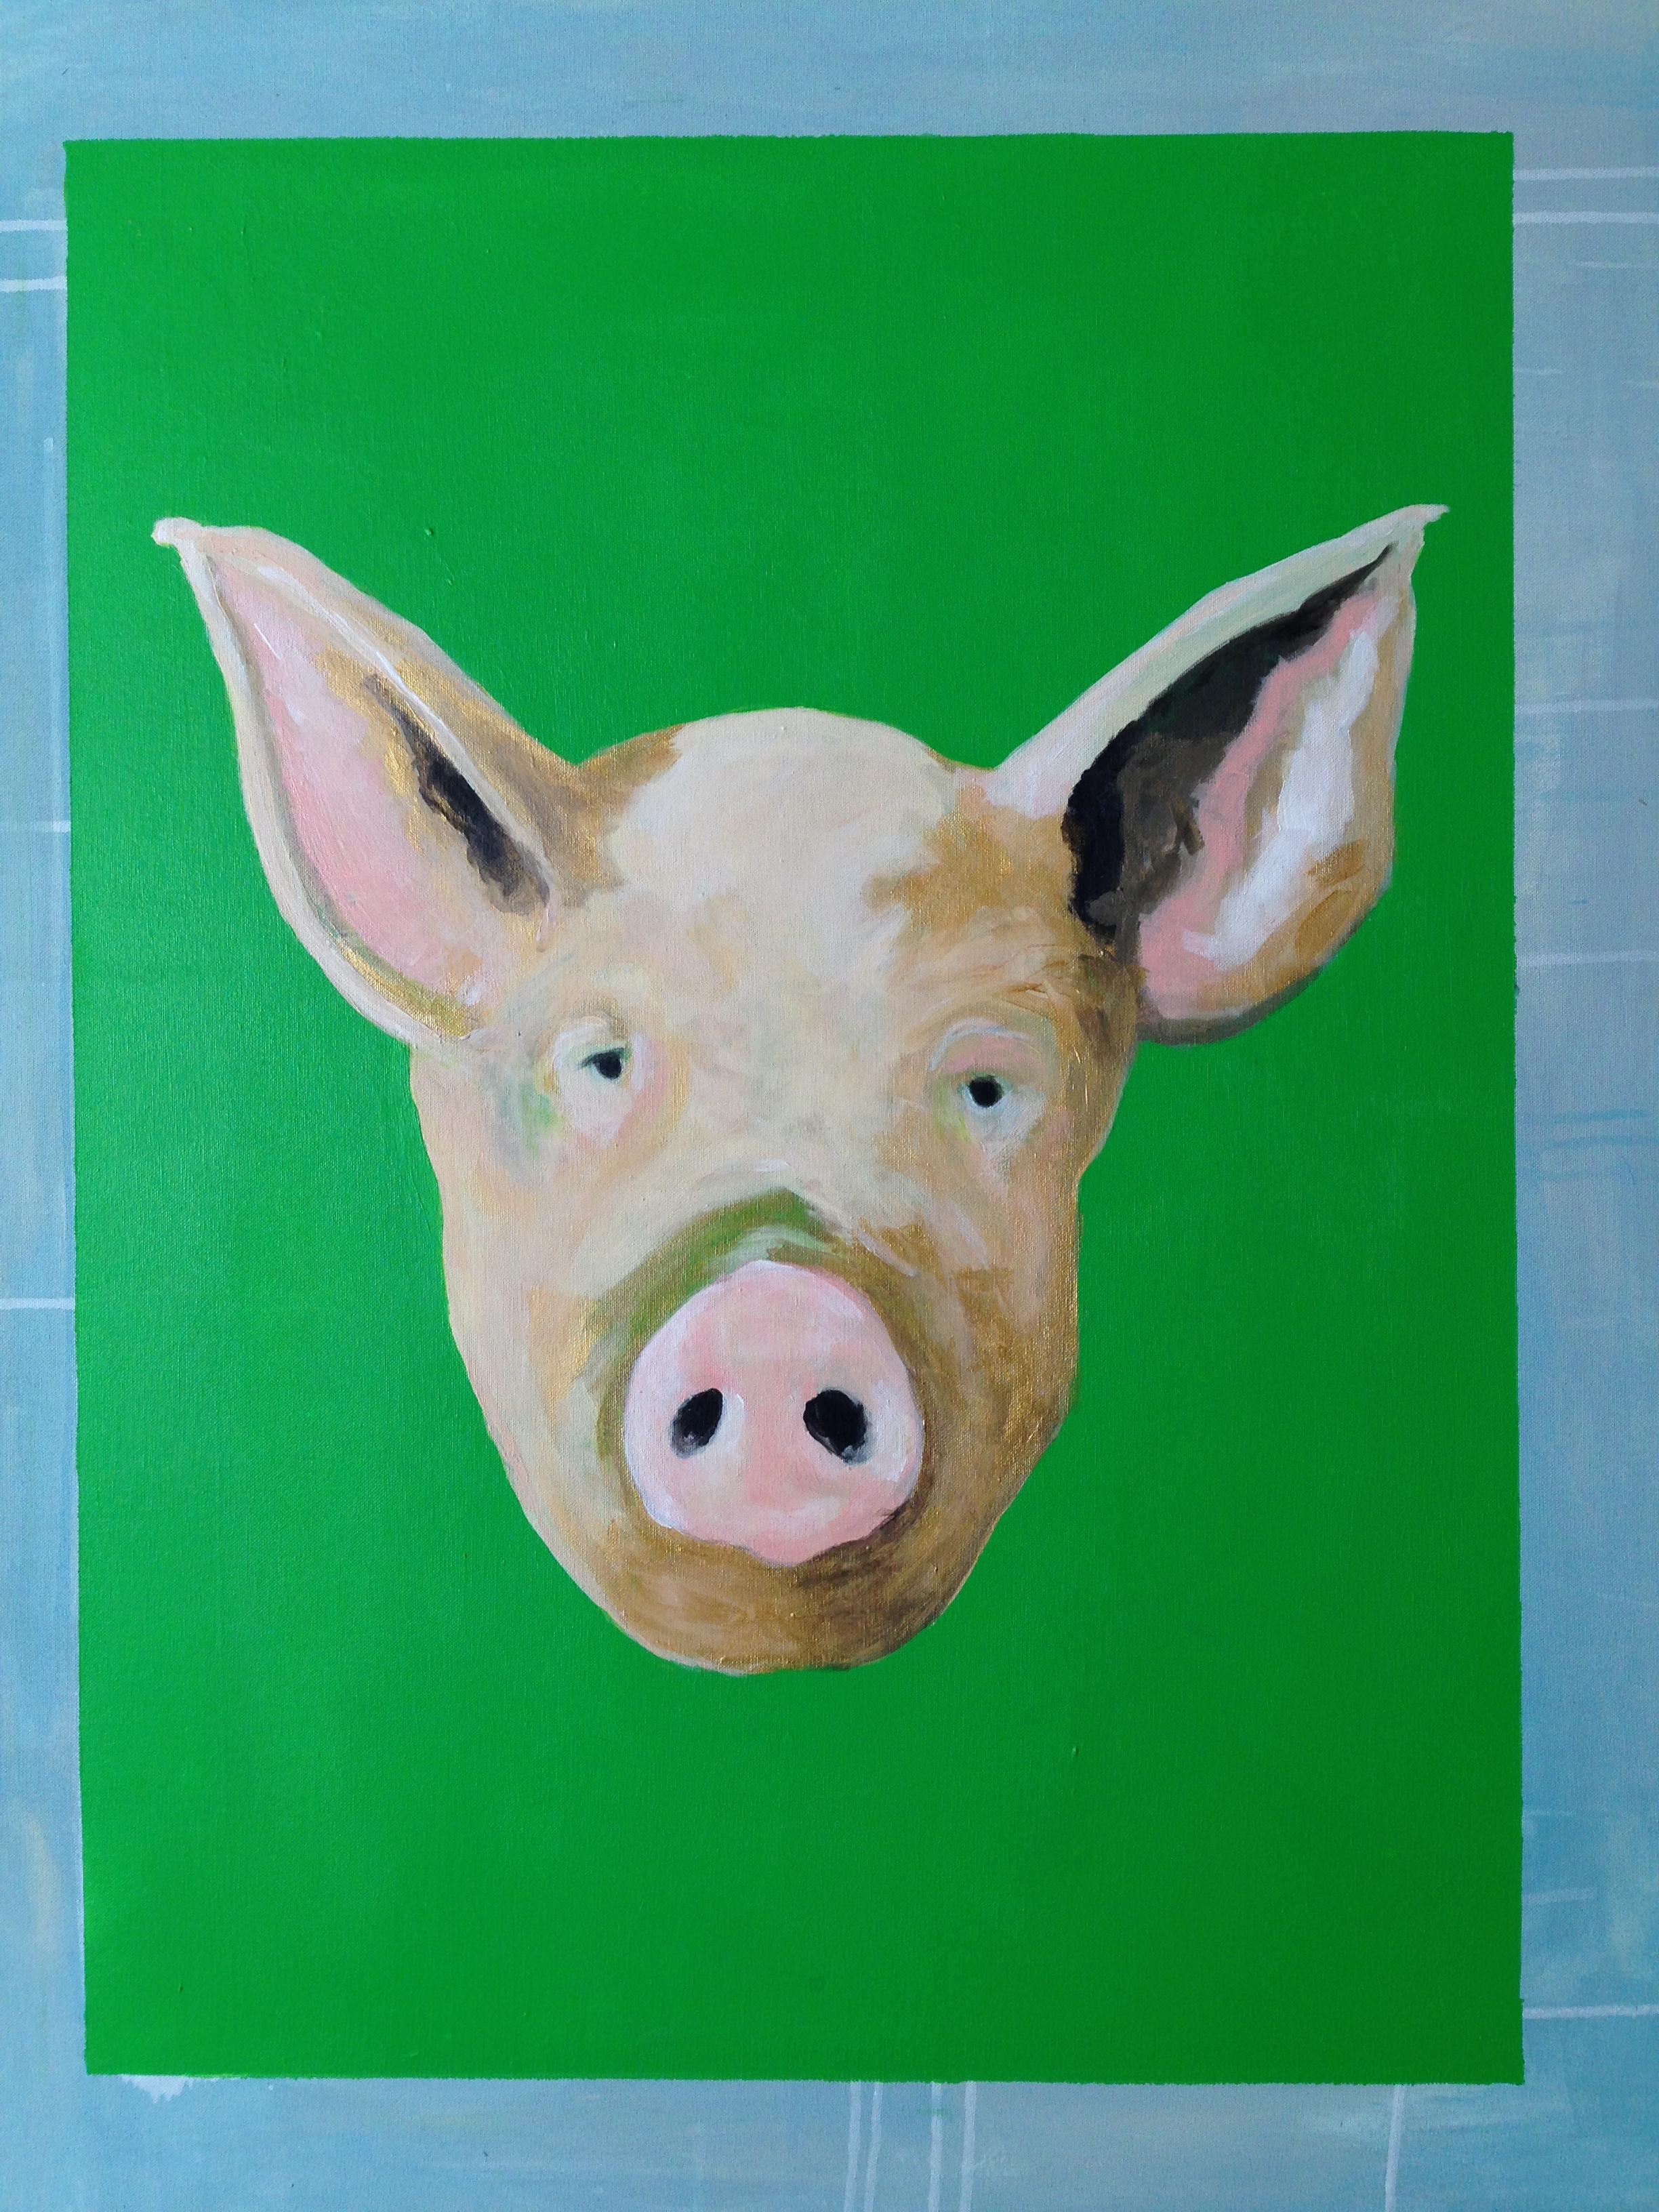 Central Pork